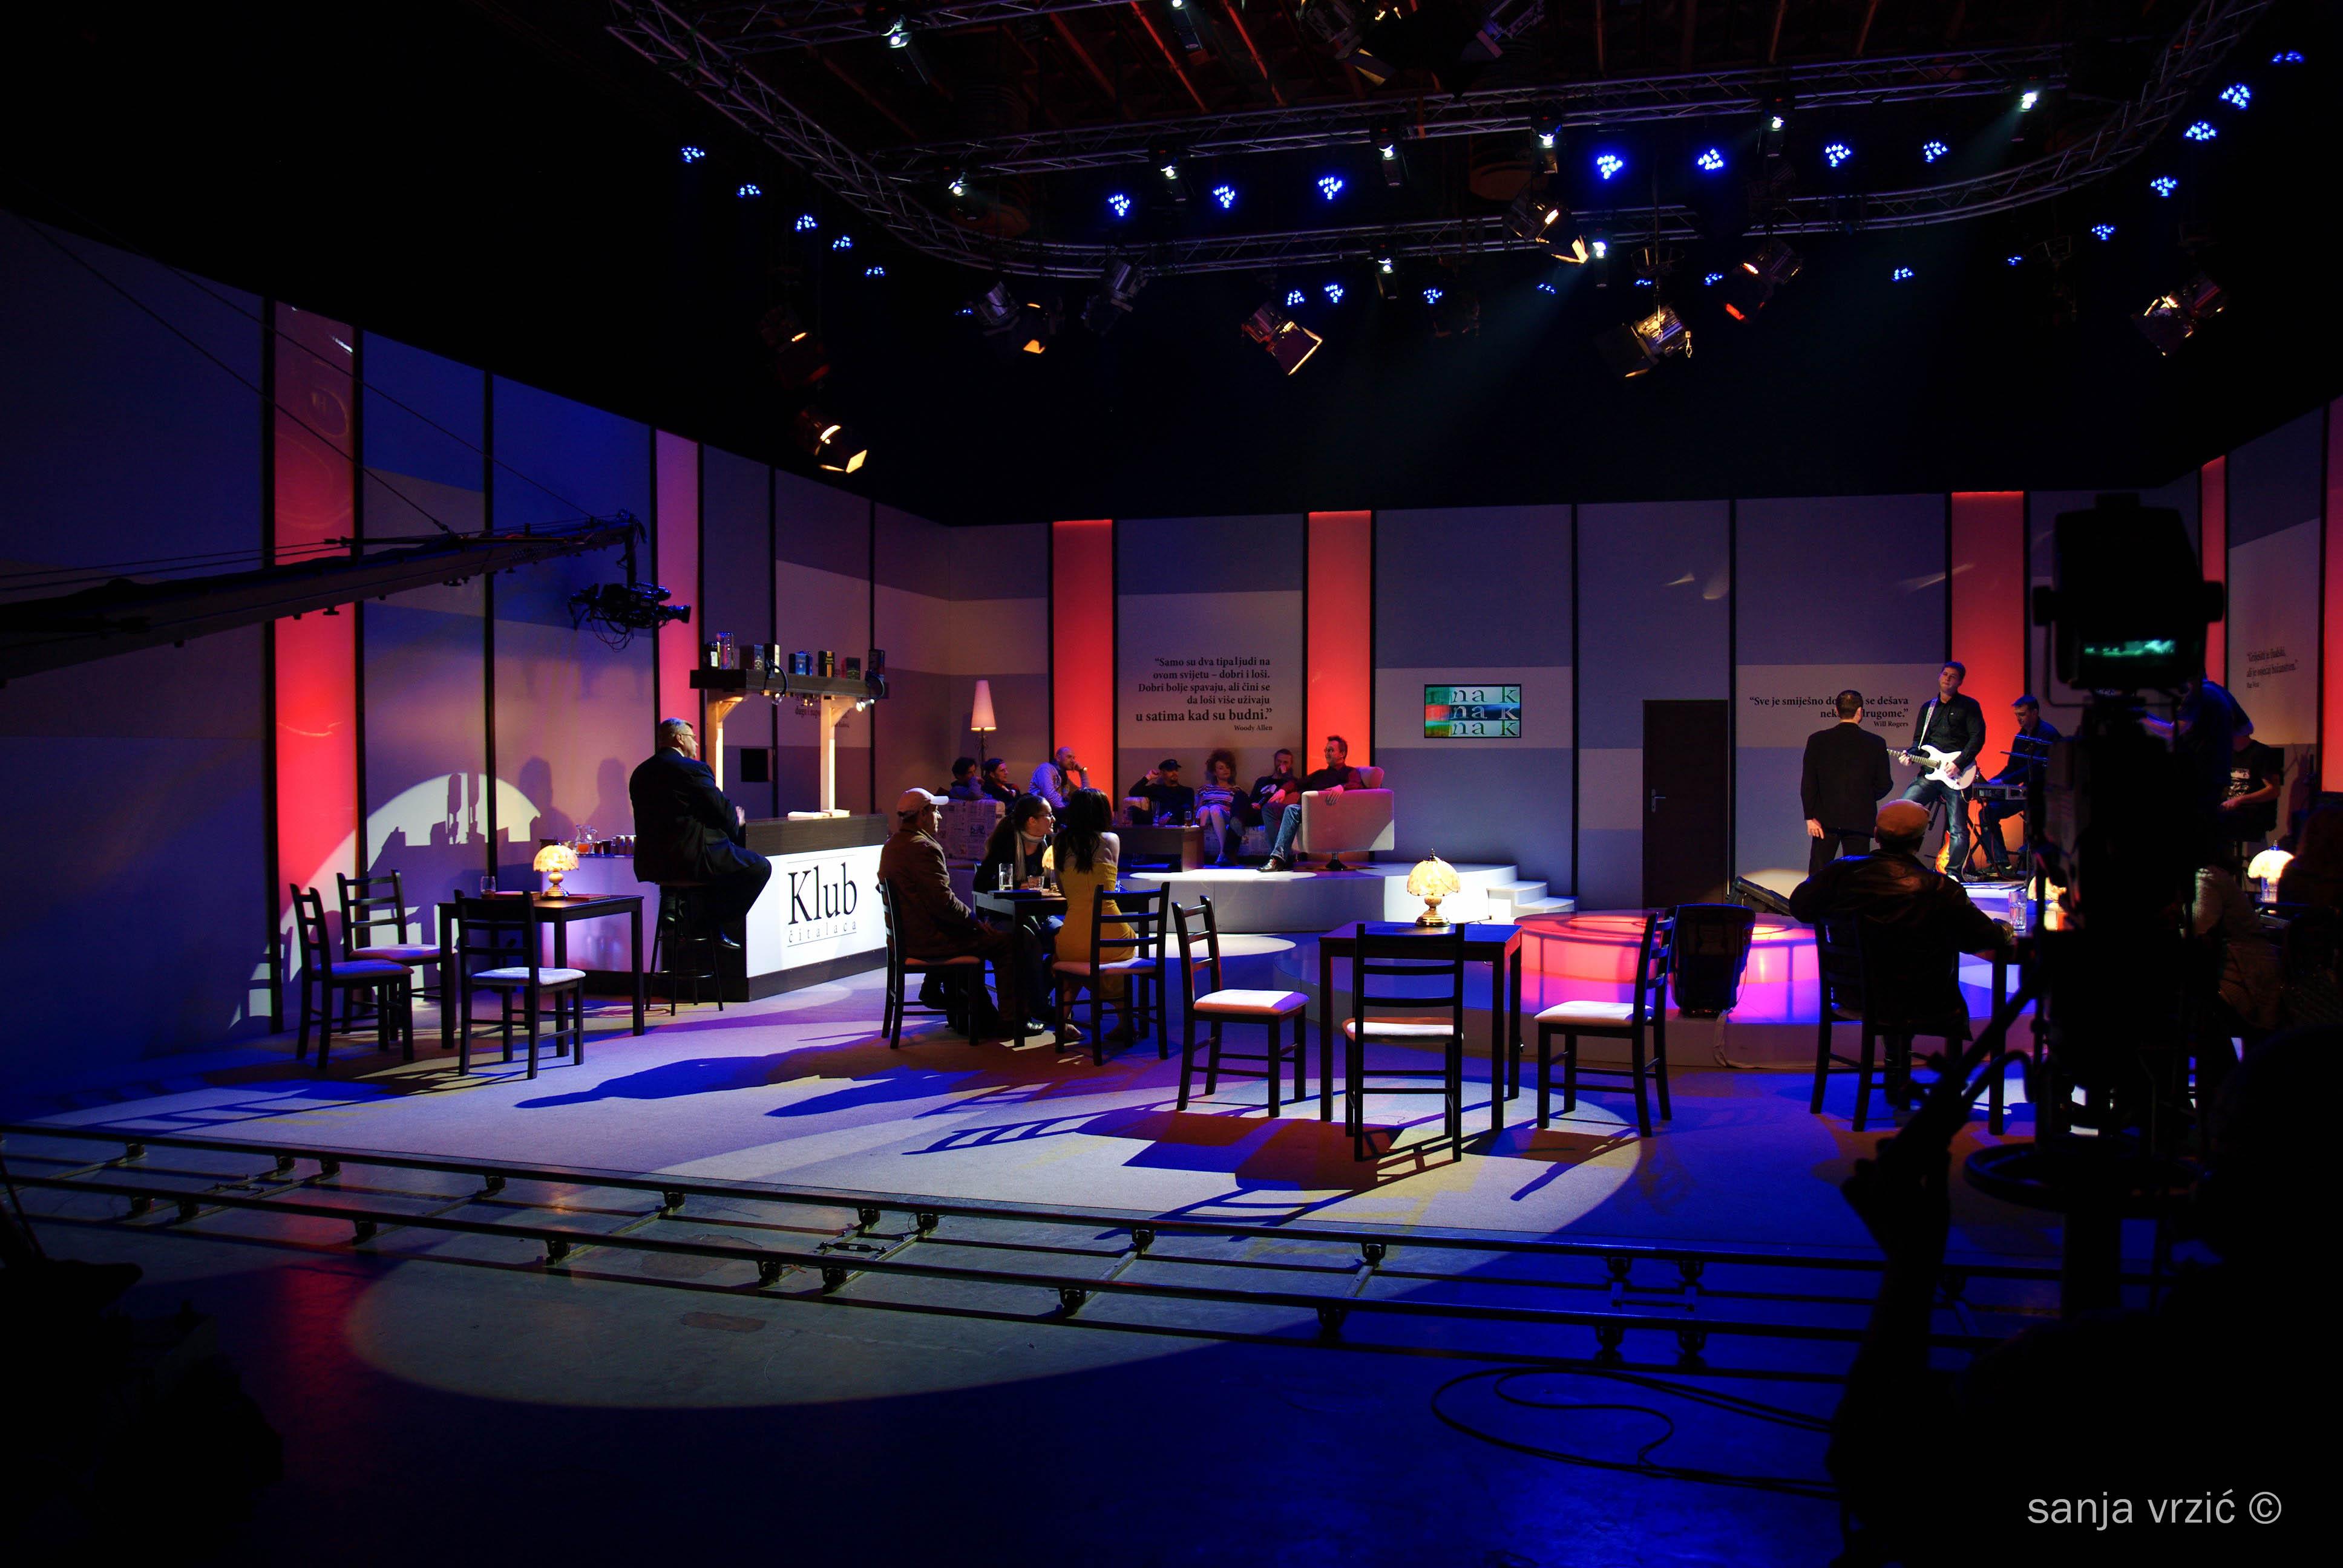 Talk Show Studio Tv talk show host,